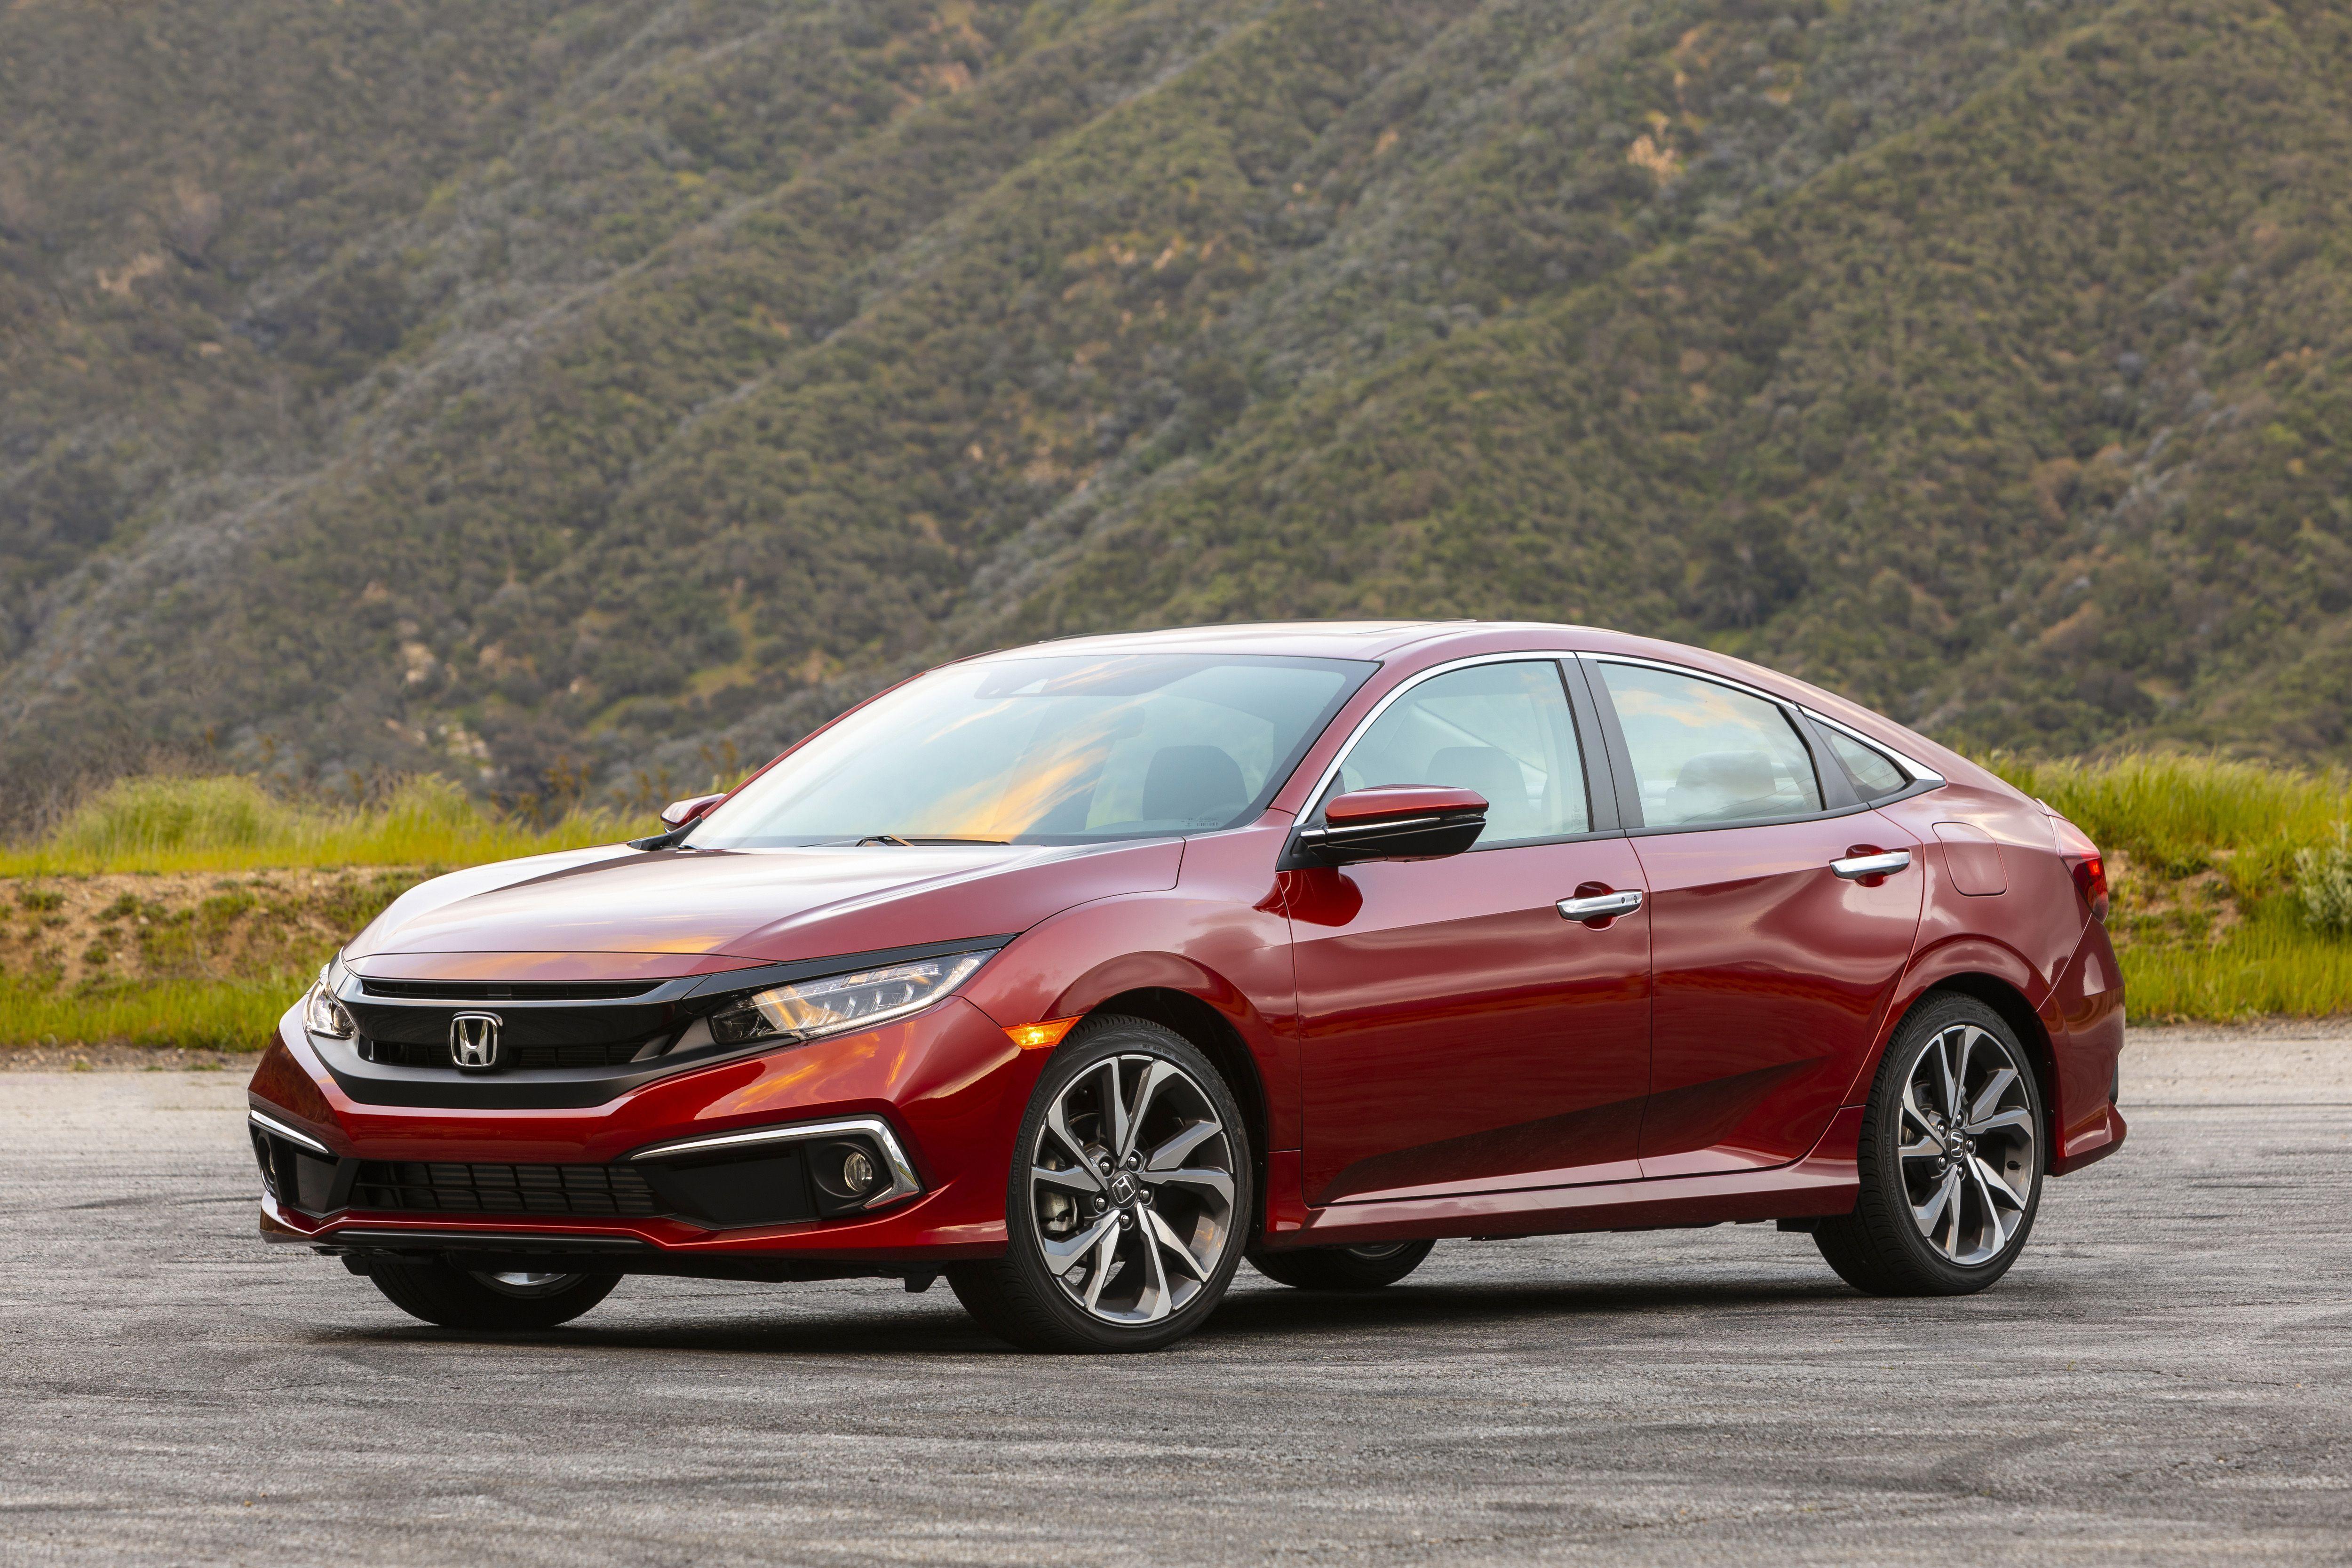 2020 Honda Civic Sedan And Coupe Prices Rise Slightly Civic Sedan Honda Civic Honda Civic Sedan